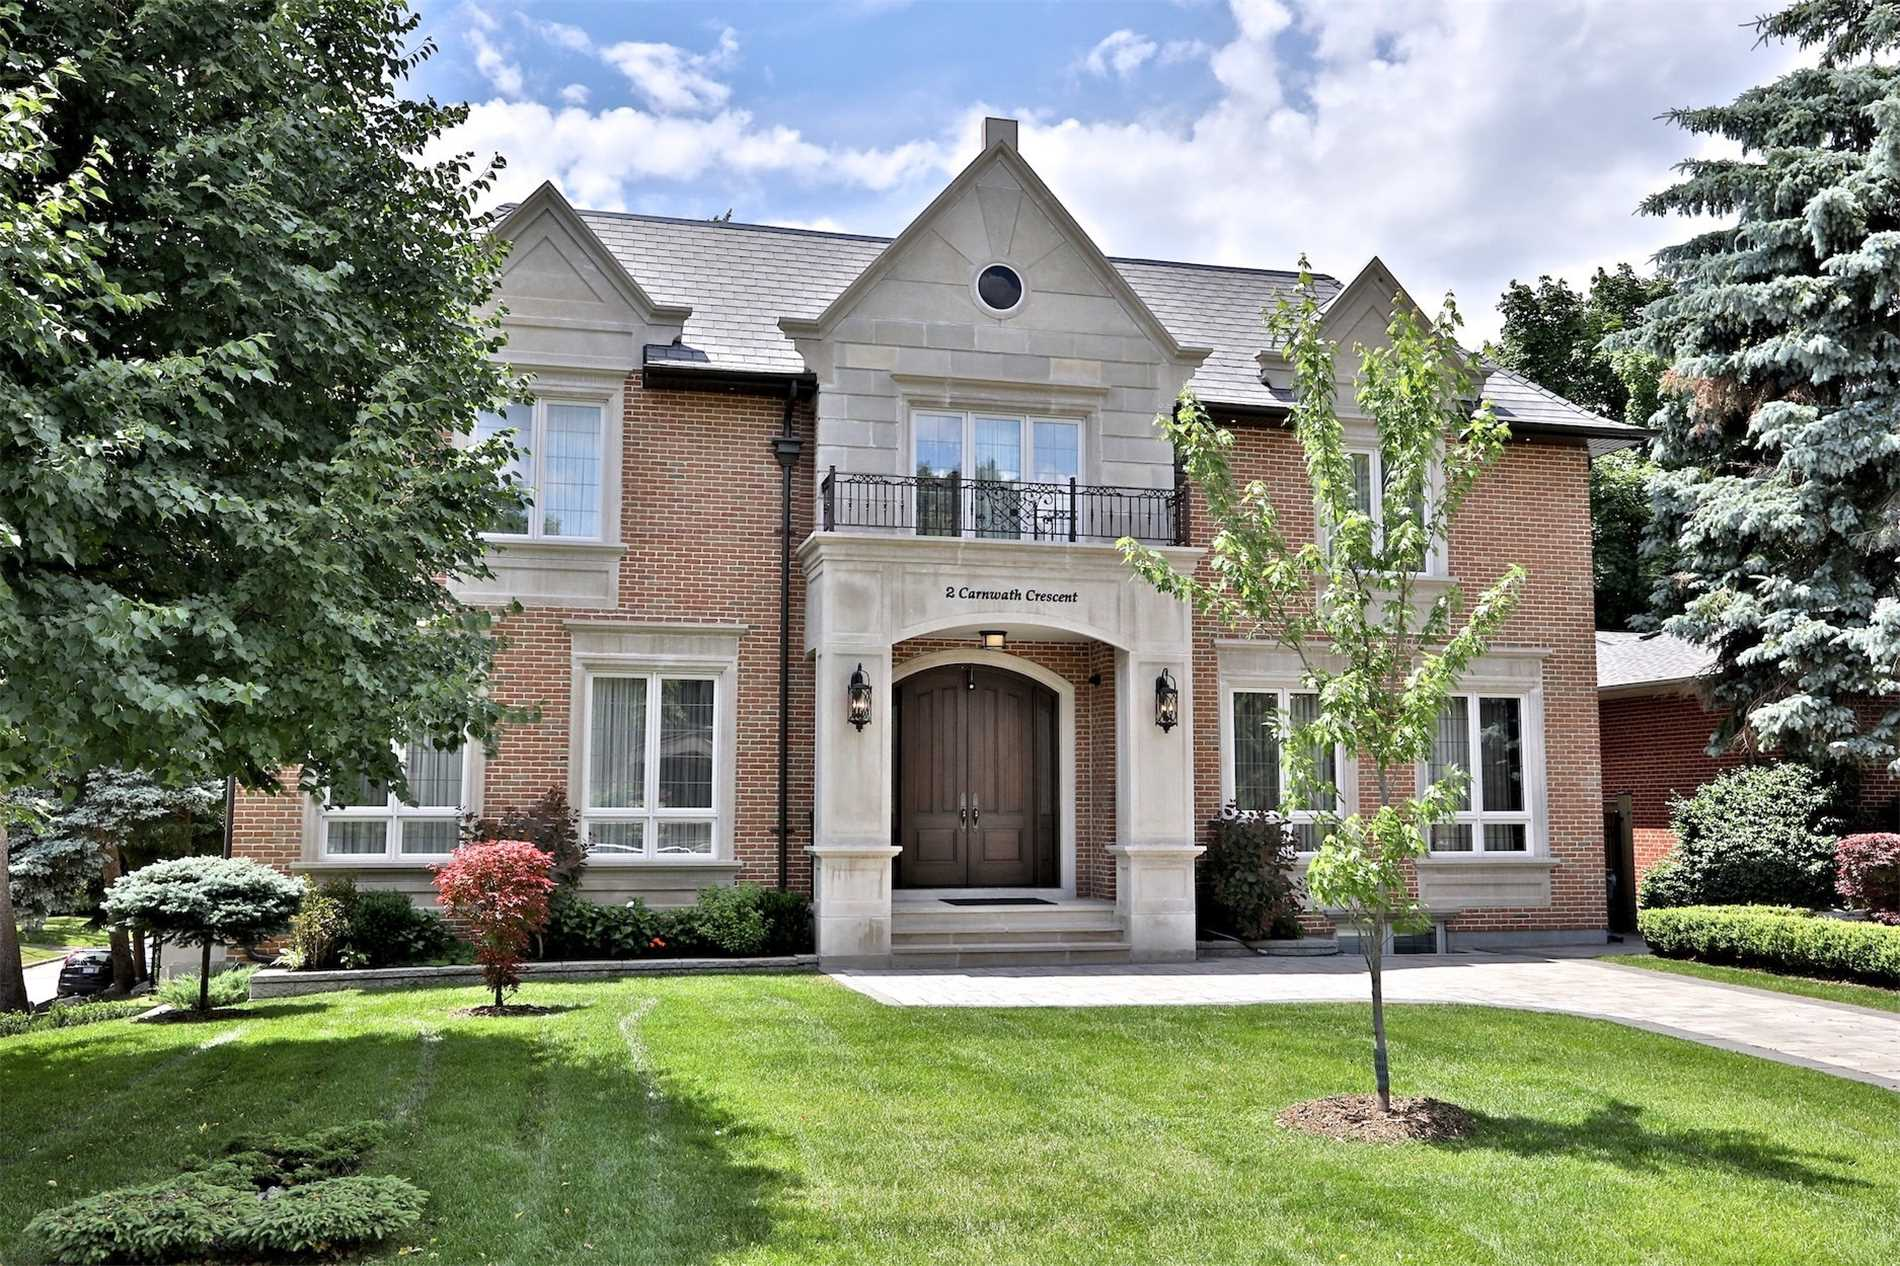 2 Carnwath Cres, Toronto, Ontario M2P 1J5, 5 Bedrooms Bedrooms, 11 Rooms Rooms,9 BathroomsBathrooms,Detached,For Sale,Carnwath,C4809275